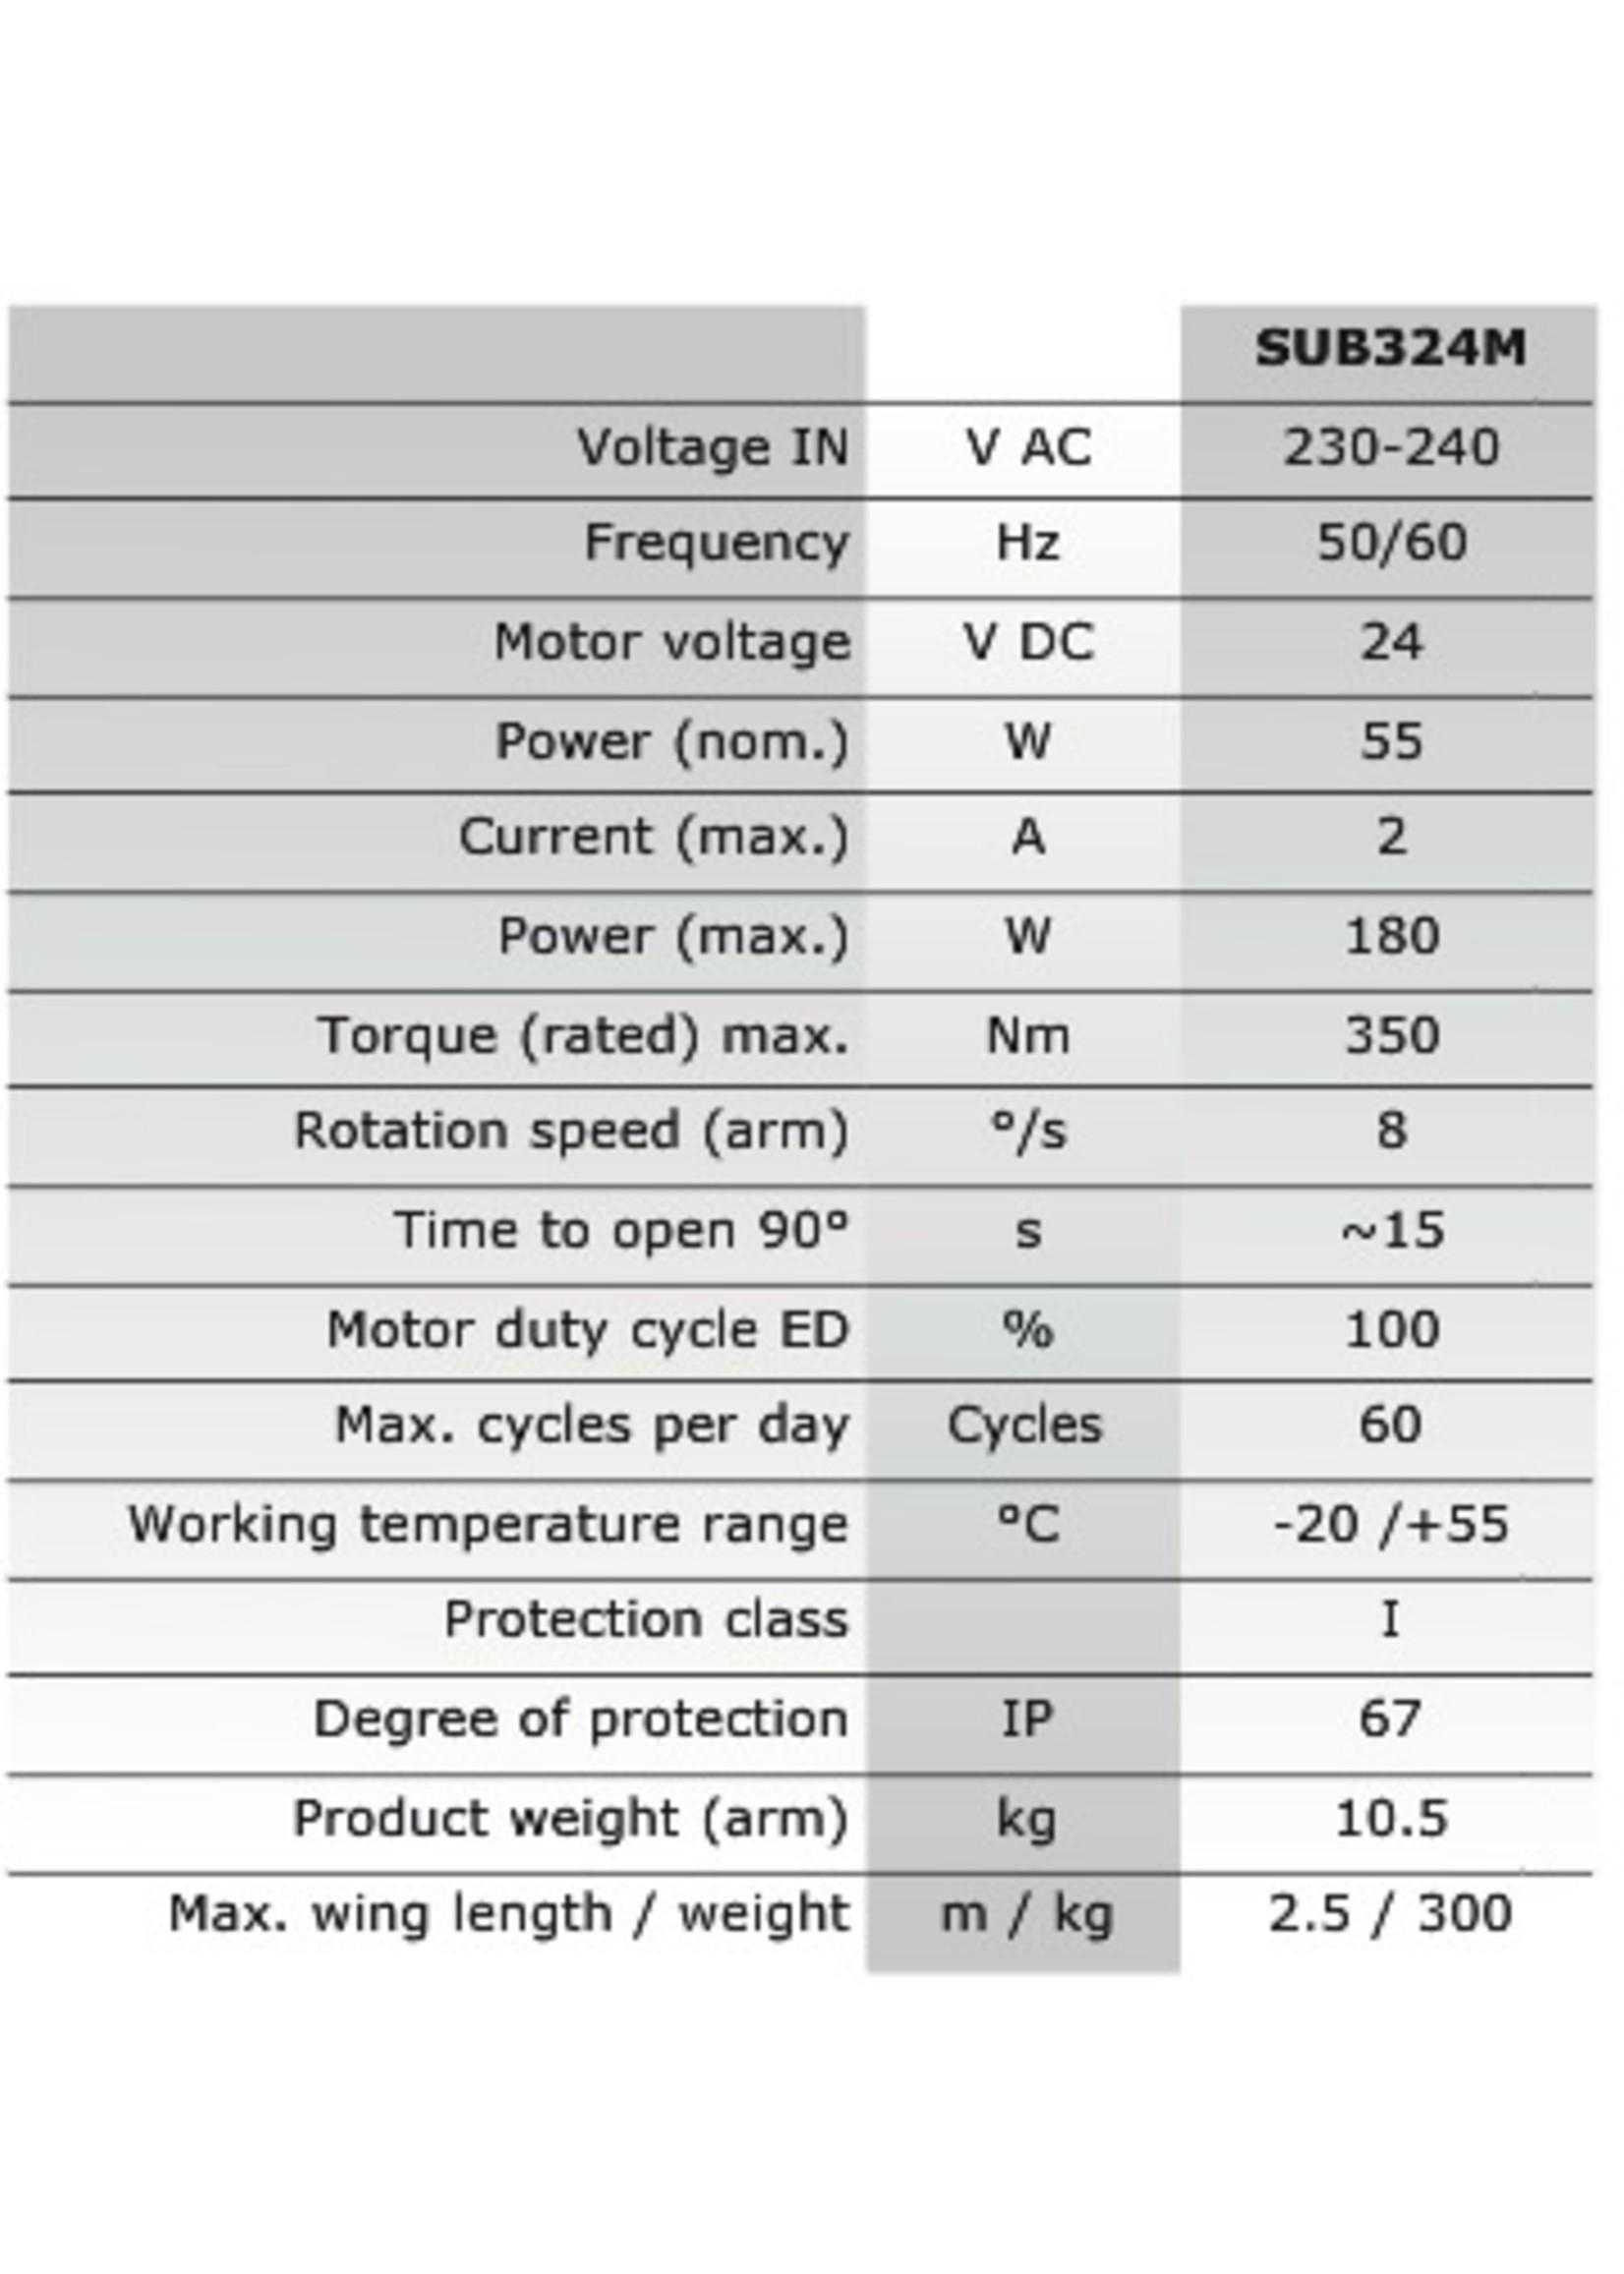 Liftmaster SUB324K 24V automatisme portail à battants